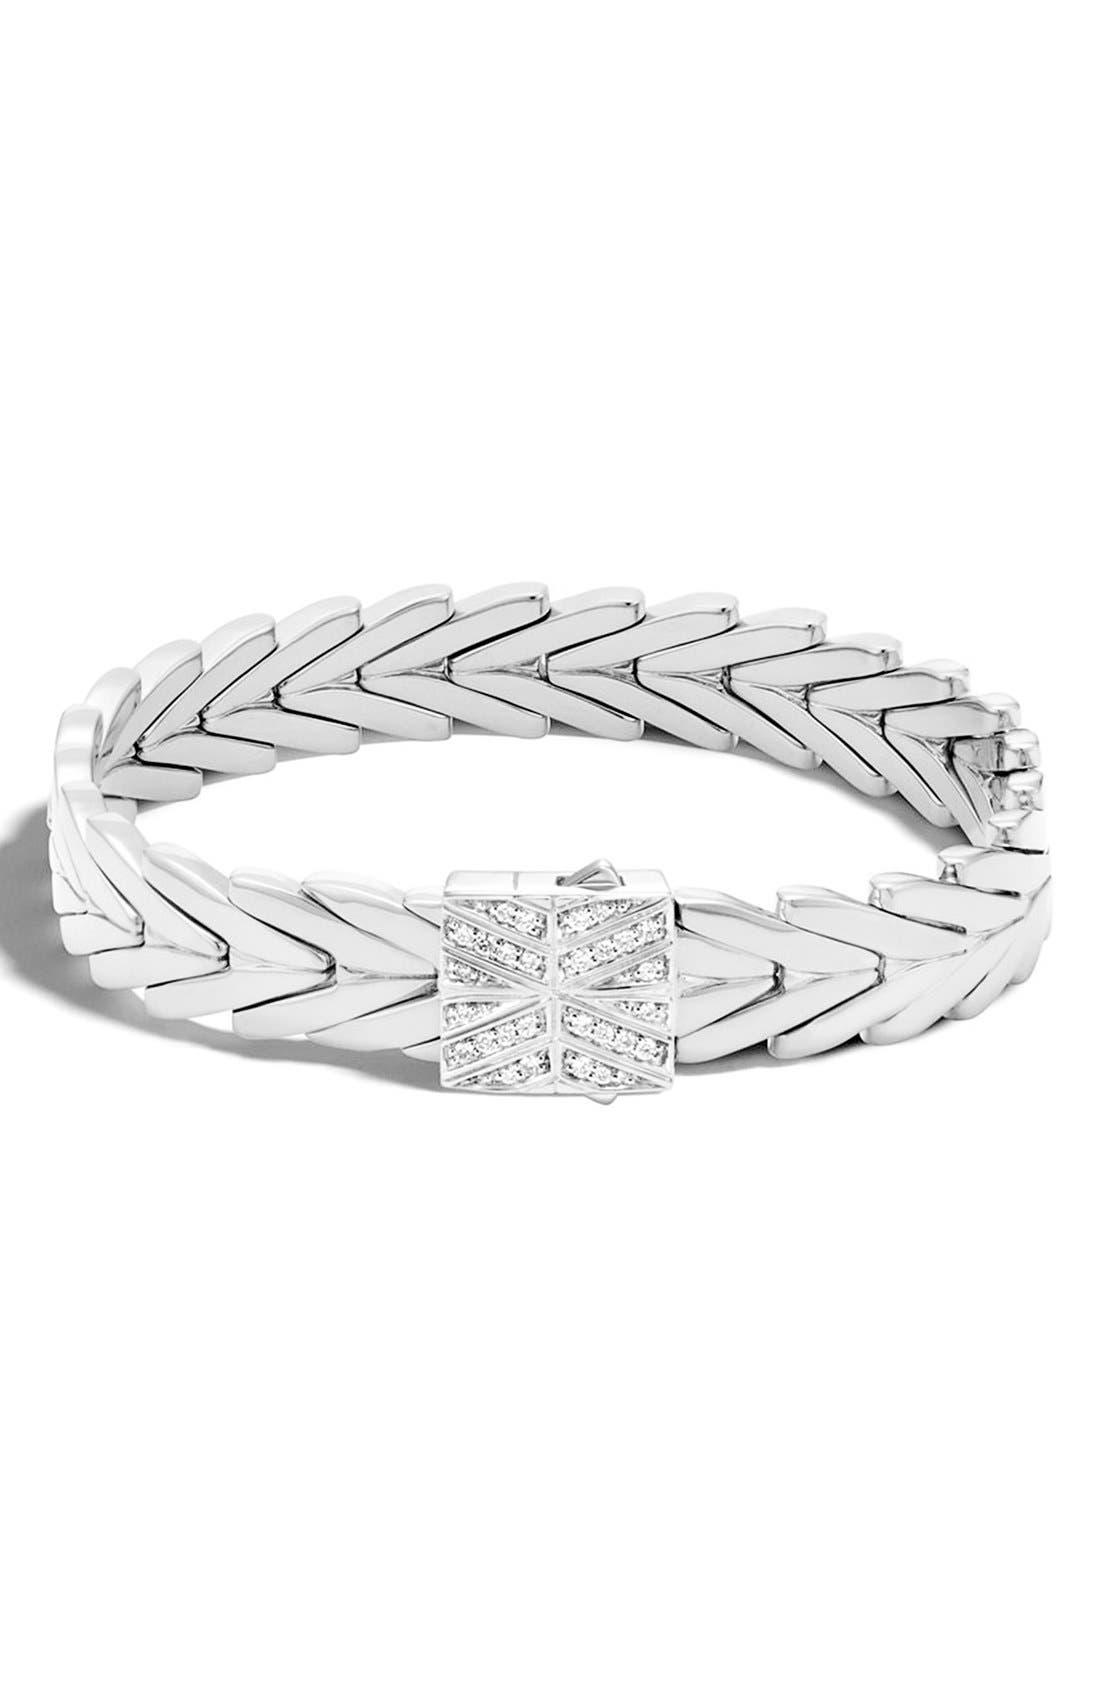 Alternate Image 1 Selected - John Hardy 'Classic' Link Bracelet